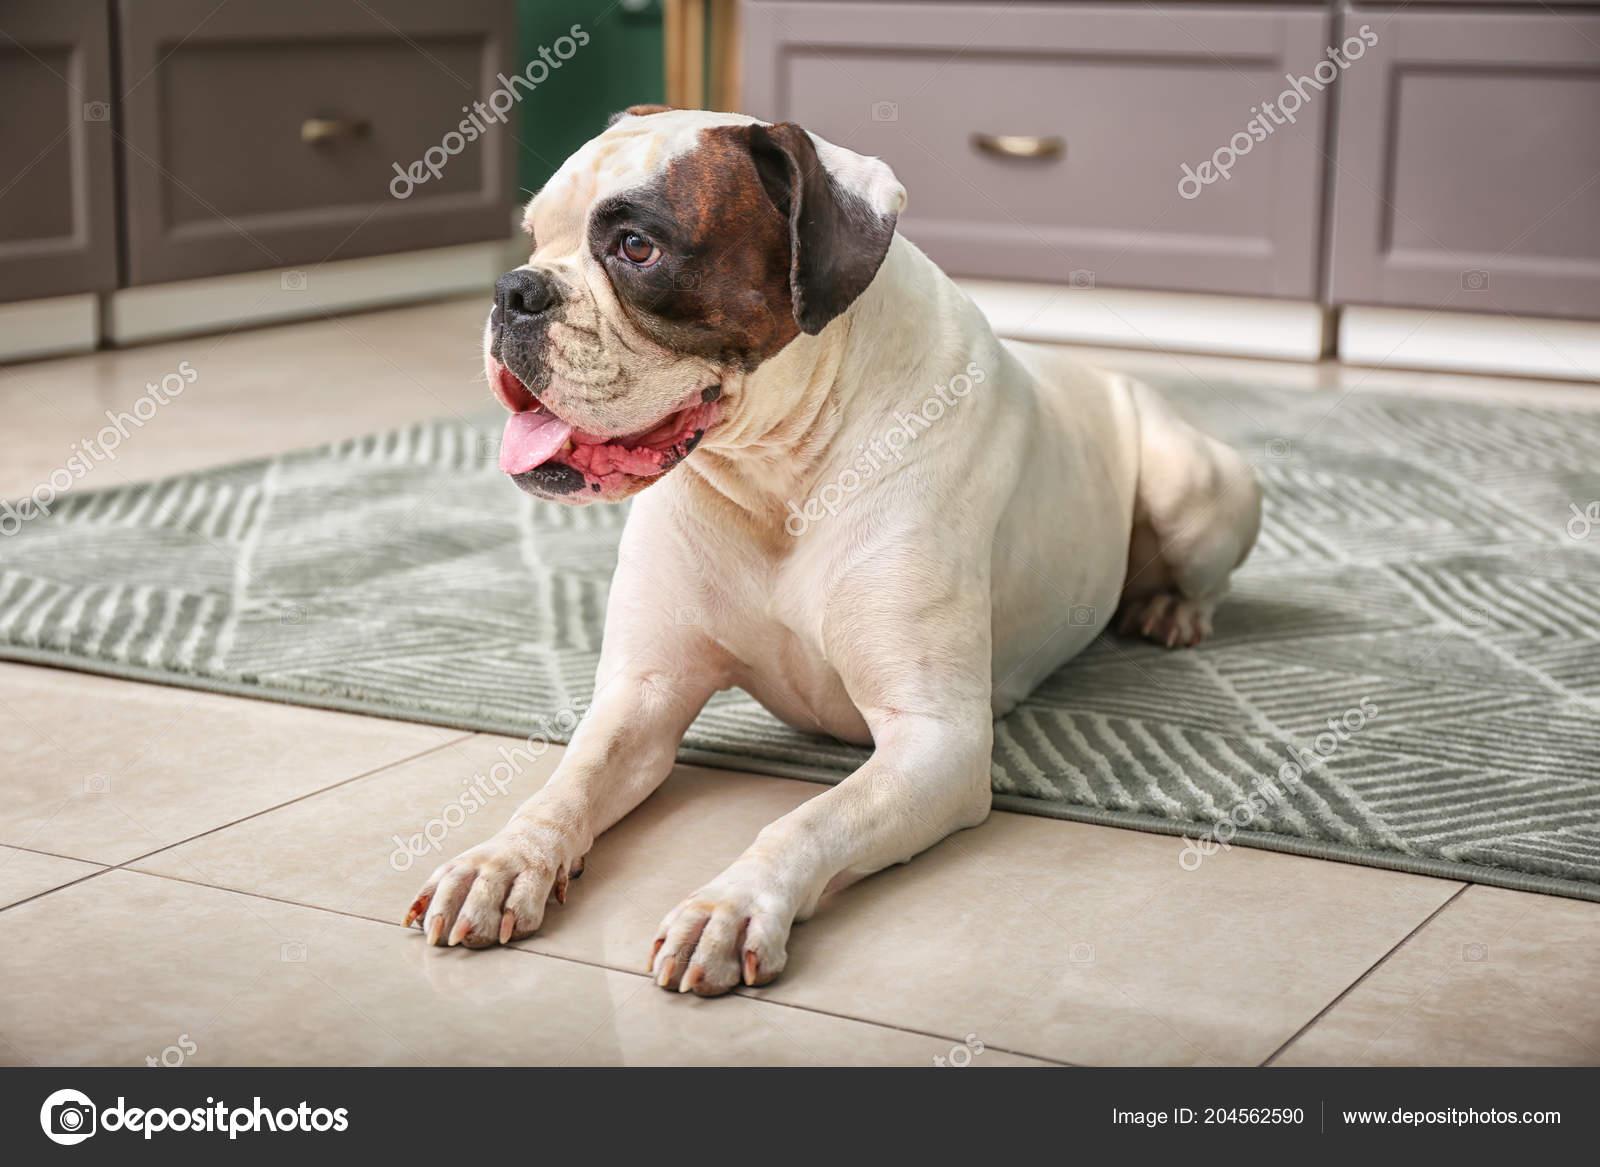 Süße Lustige Hund Küche — Stockfoto © serezniy #204562590